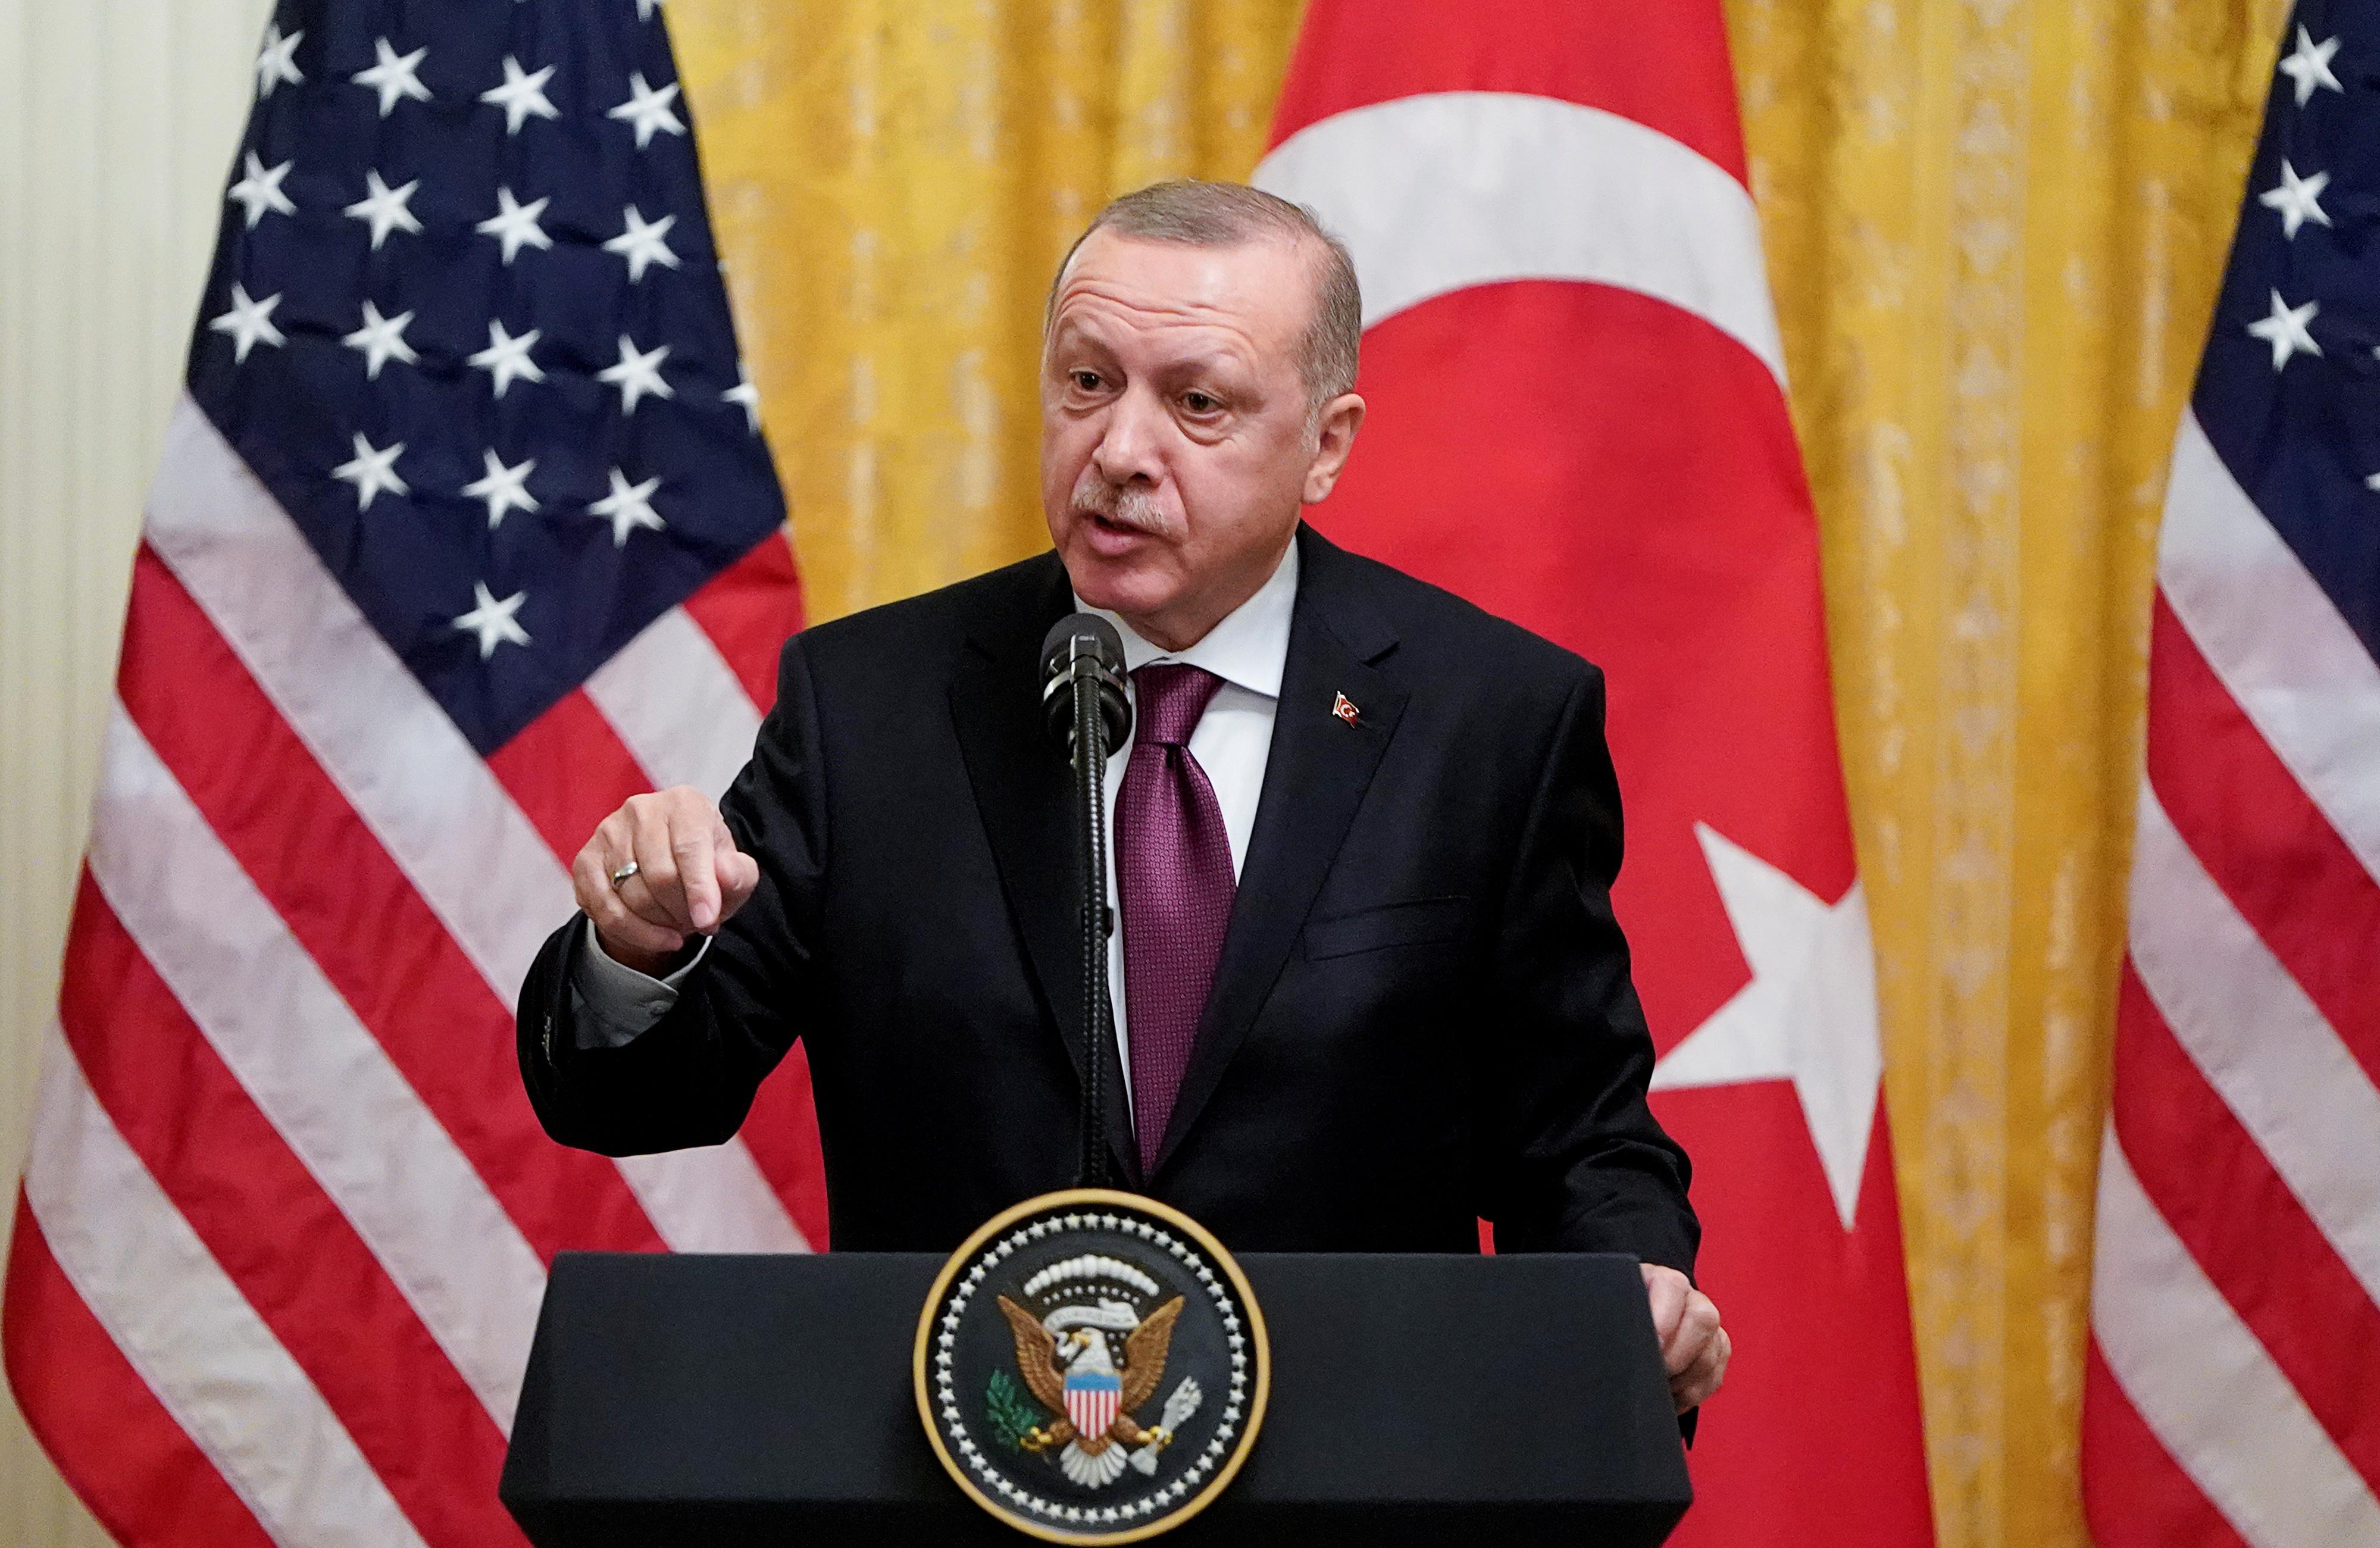 Erdogan says Turkey aware that U.S. support for Kurdish YPG will...